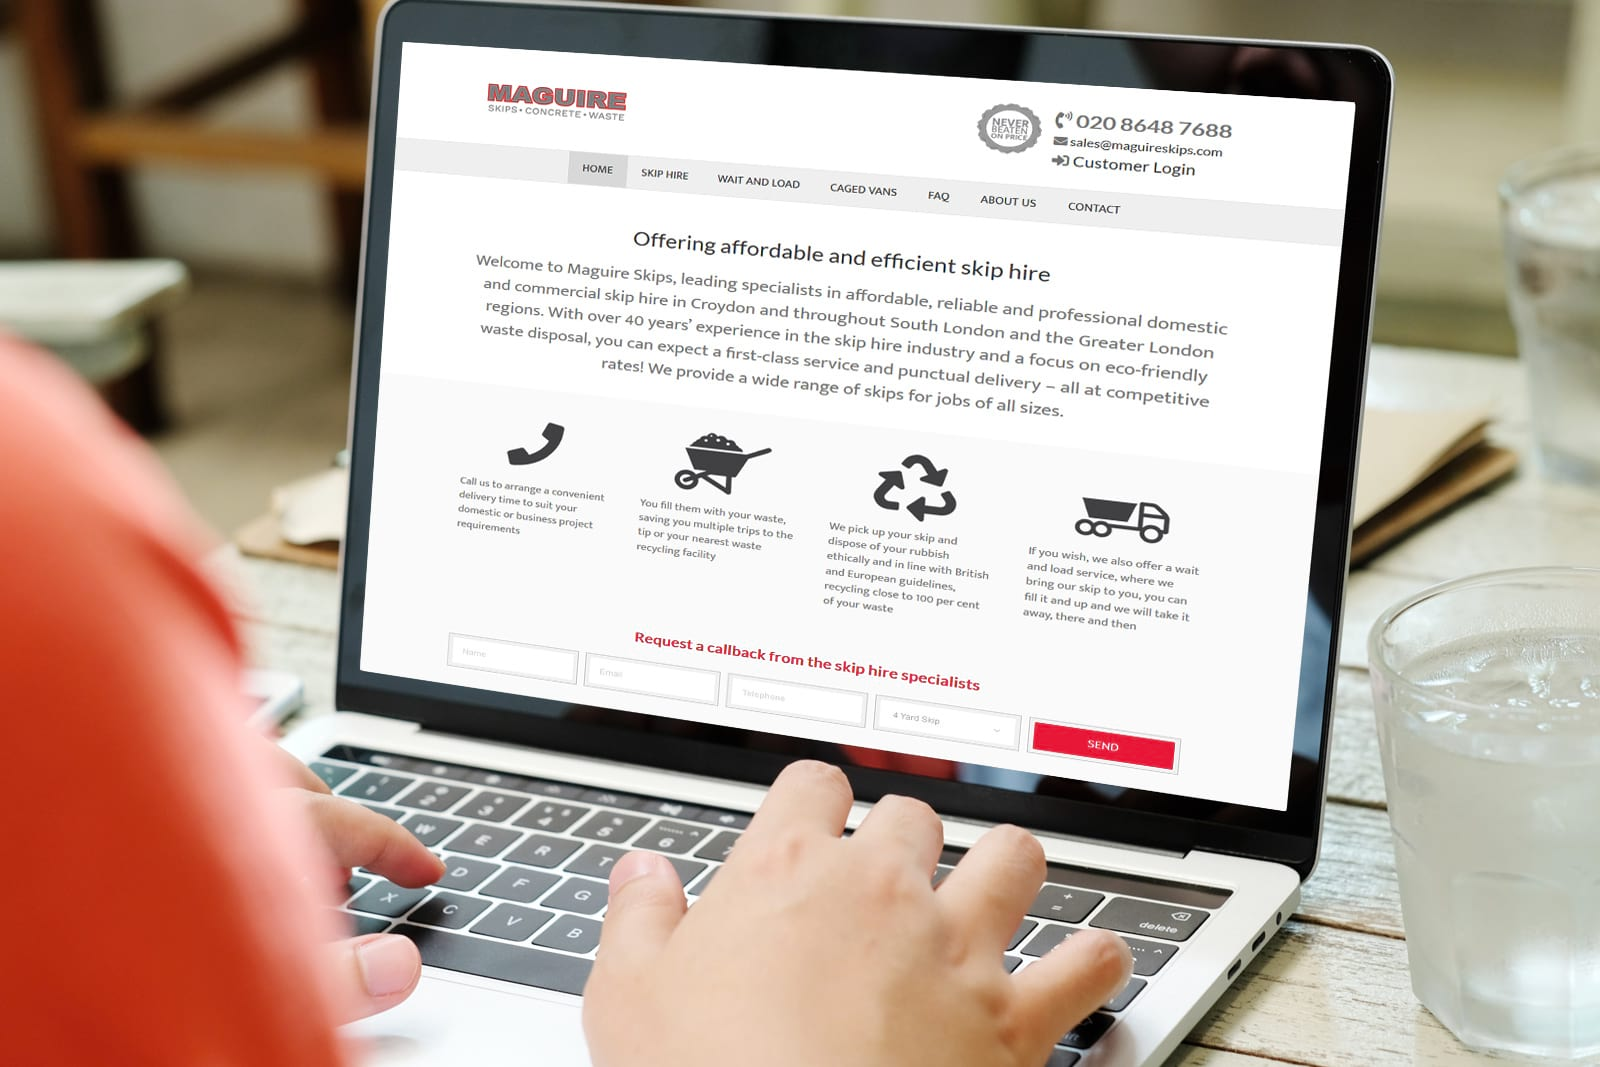 Maguire Skips website builders - JJ Solutions based in Surrey